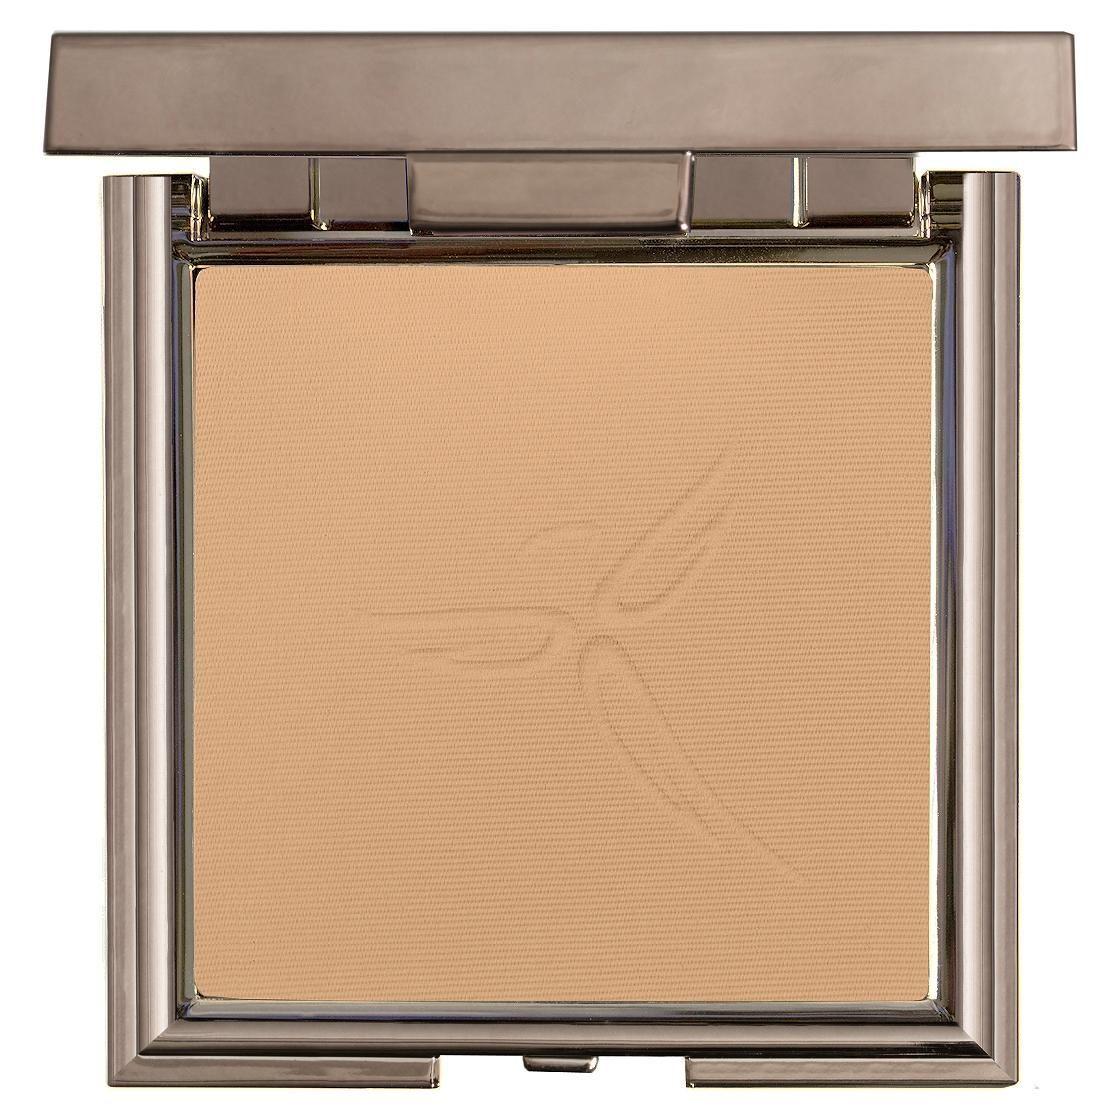 Second Skin Light Diffusing Powder Foundation N°10